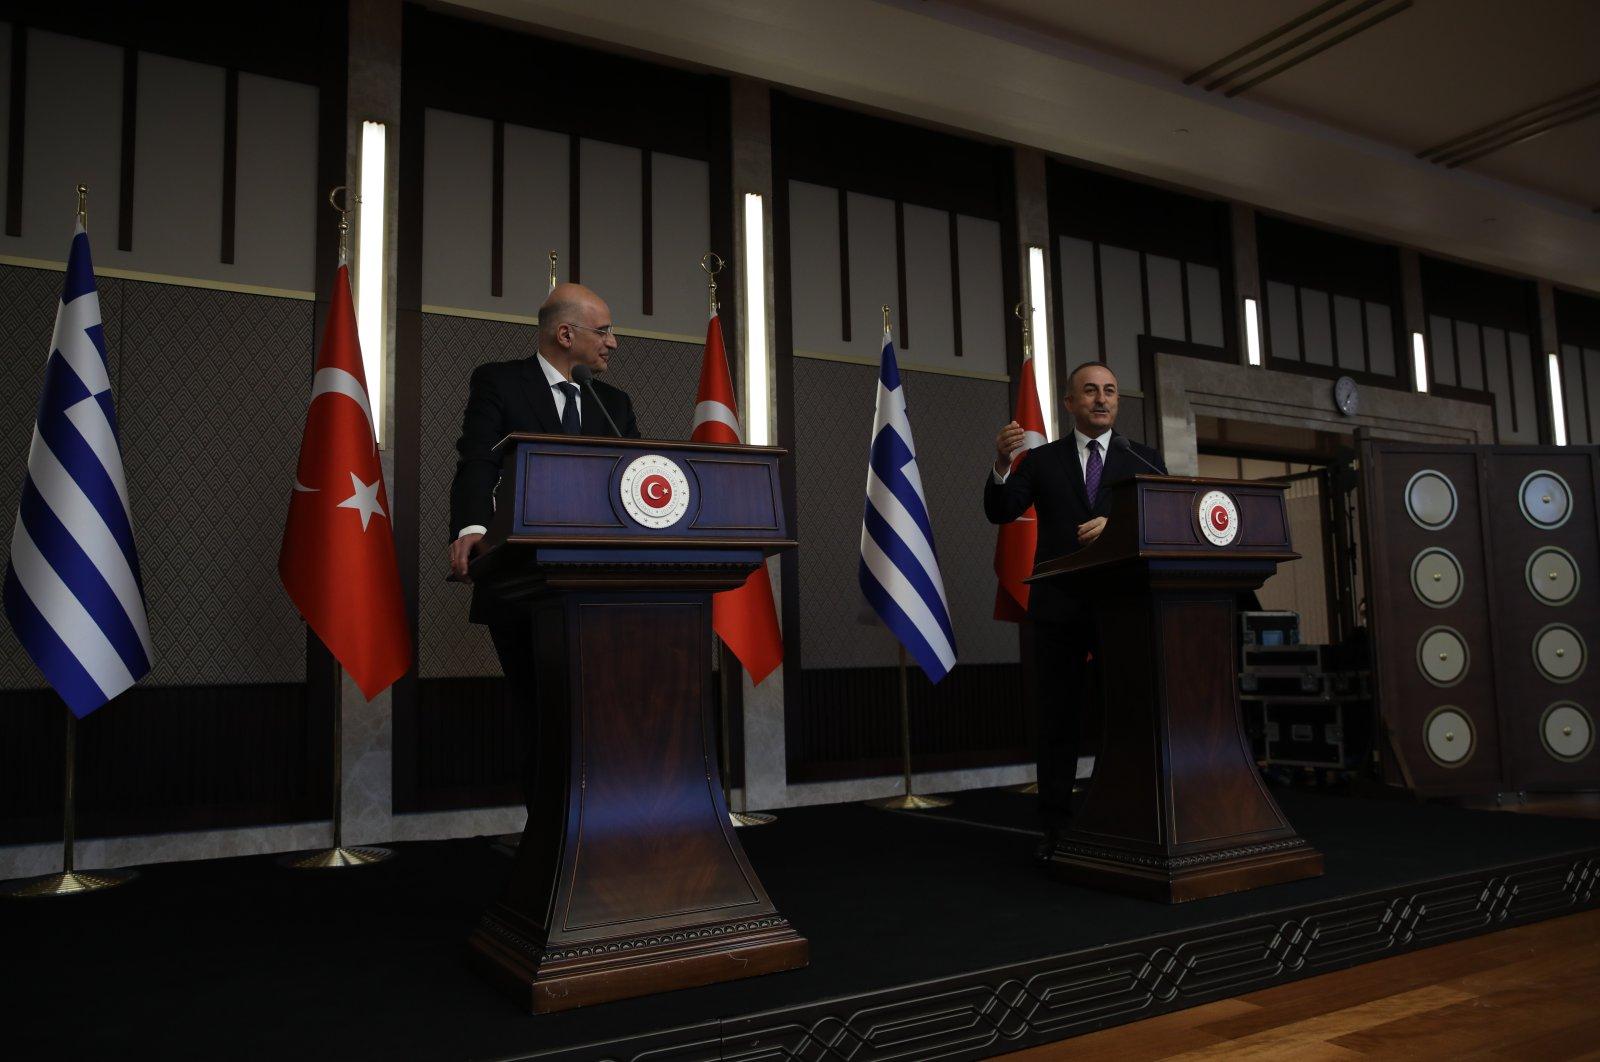 Greek Foreign Minister Nikos Dendias, left, looks on, as Turkish Foreign Minister Mevlüt Çavuşoğlu, right, gestures as he talks during a joint media statement following their meeting in Ankara, Turkey, April 15, 2021. (AP Photo)